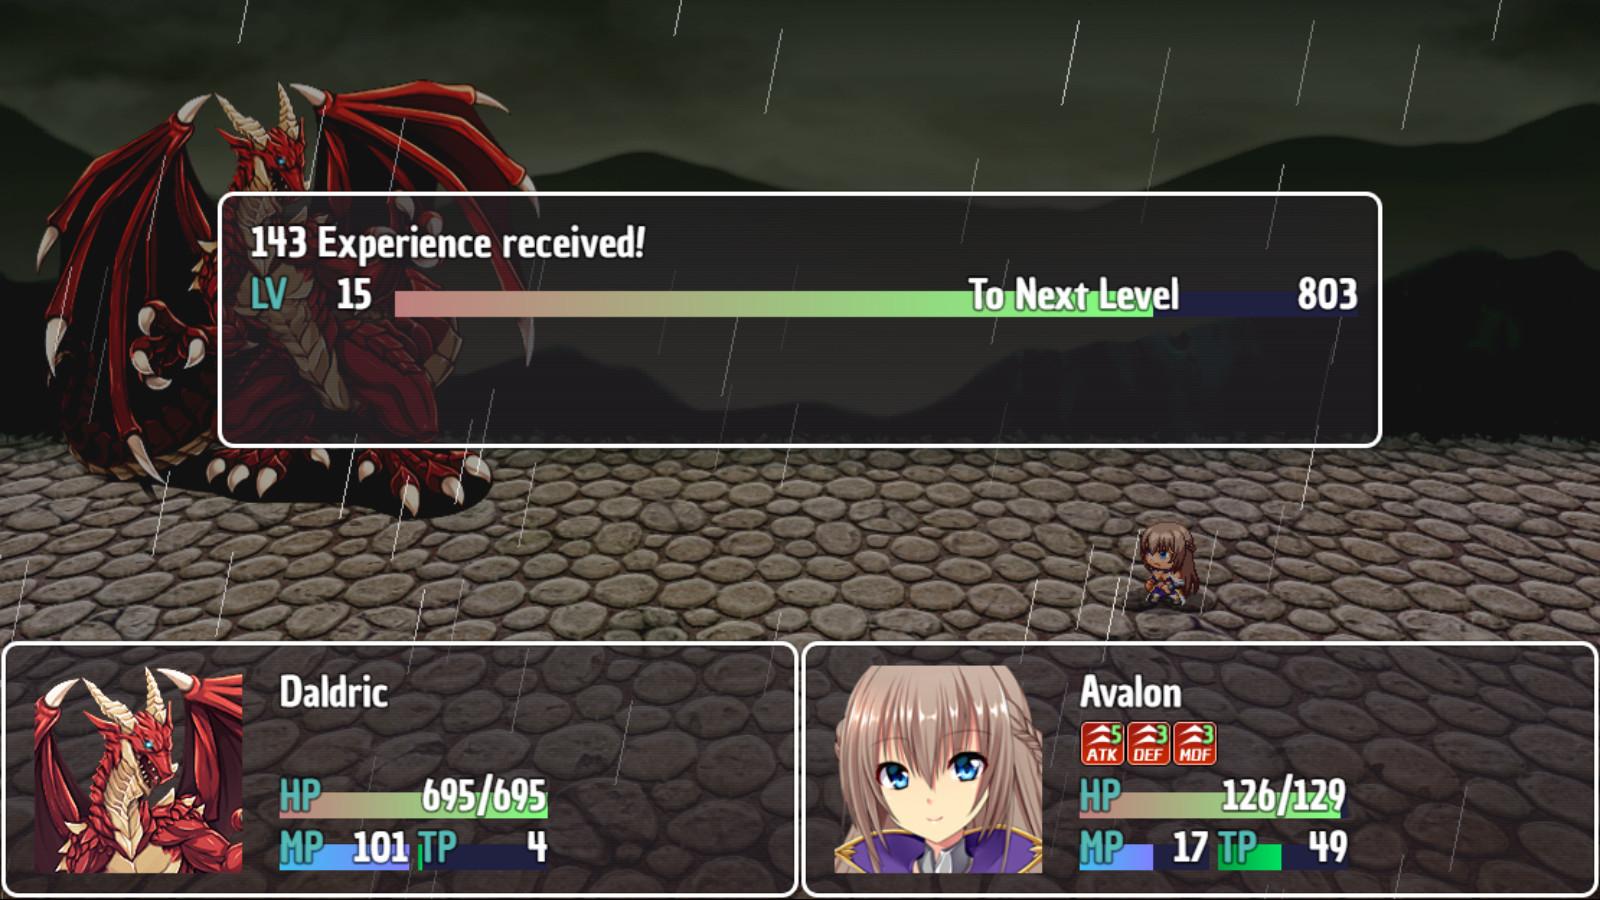 Princess Daphne - Avalon screenshot